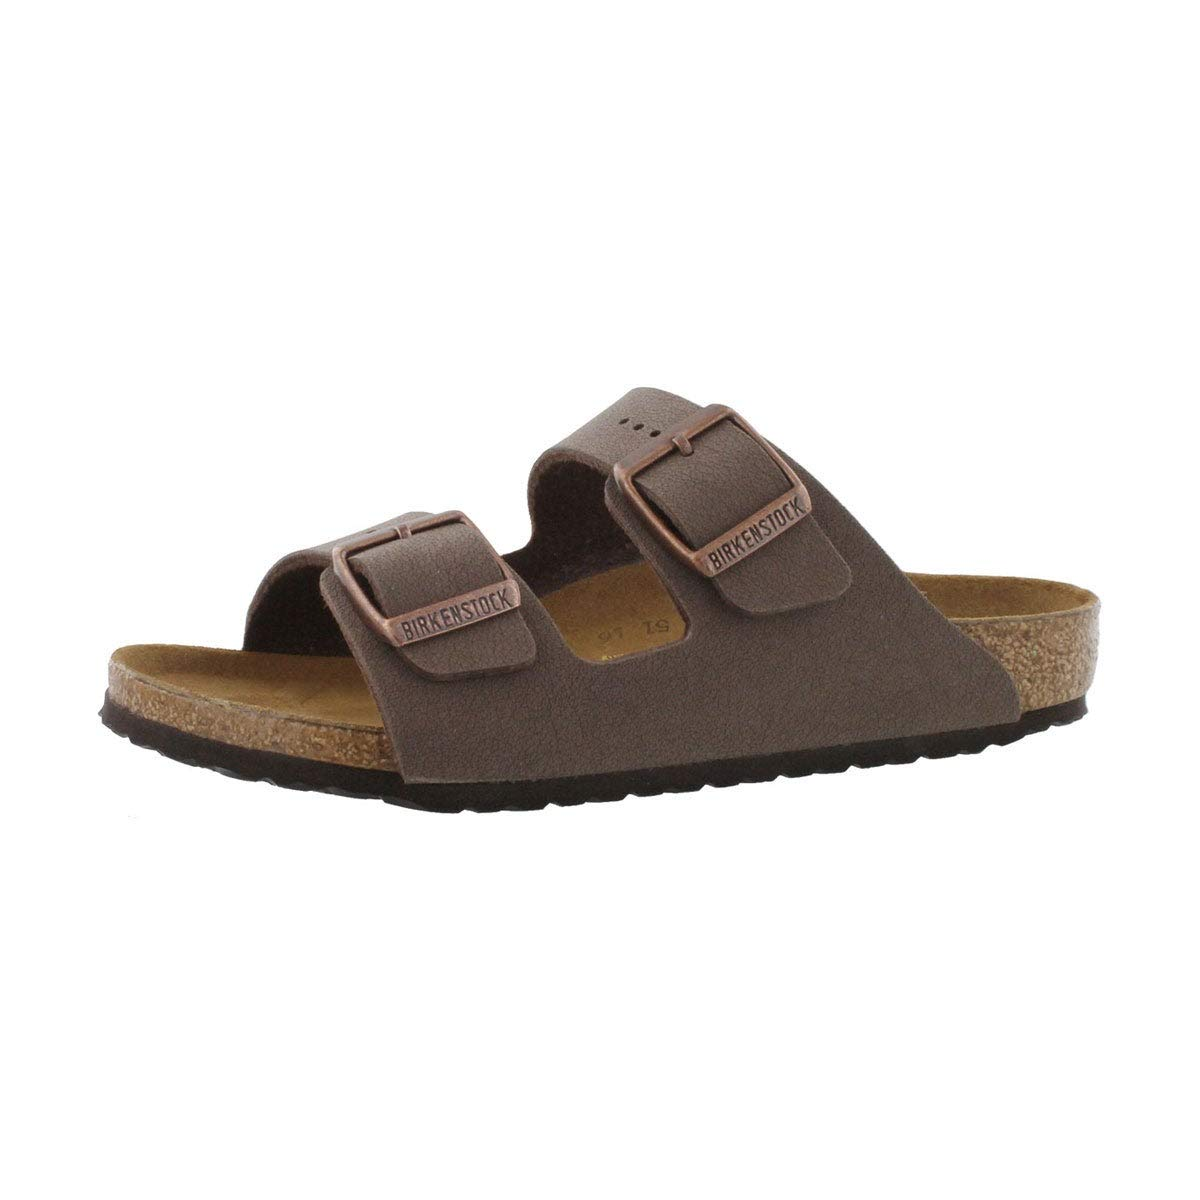 Birkenstock Boys Kids Arizona Mocca Narrow Fit Sandals Size 2